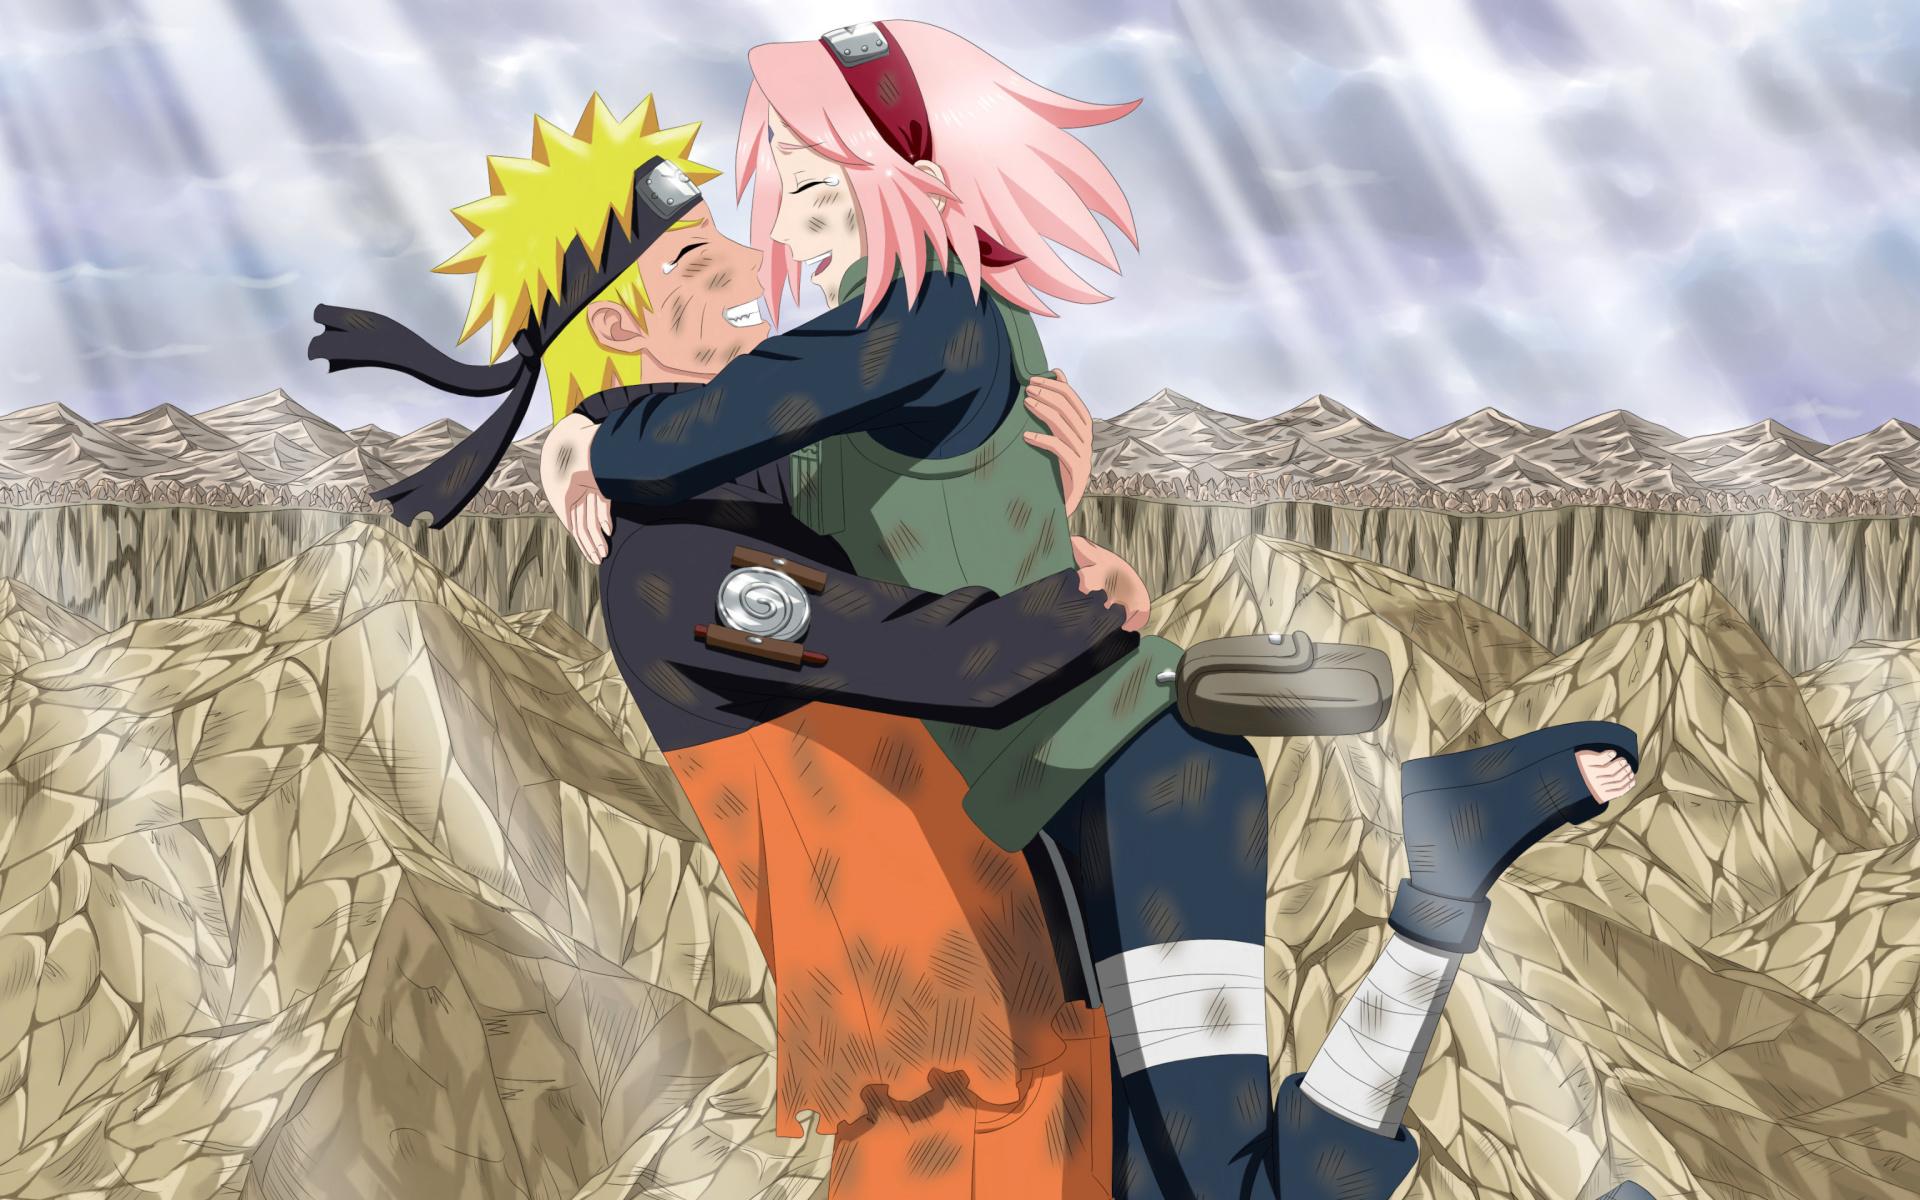 Uzumaki Naruto And Haruno Sakura Wallpaper For Widescreen